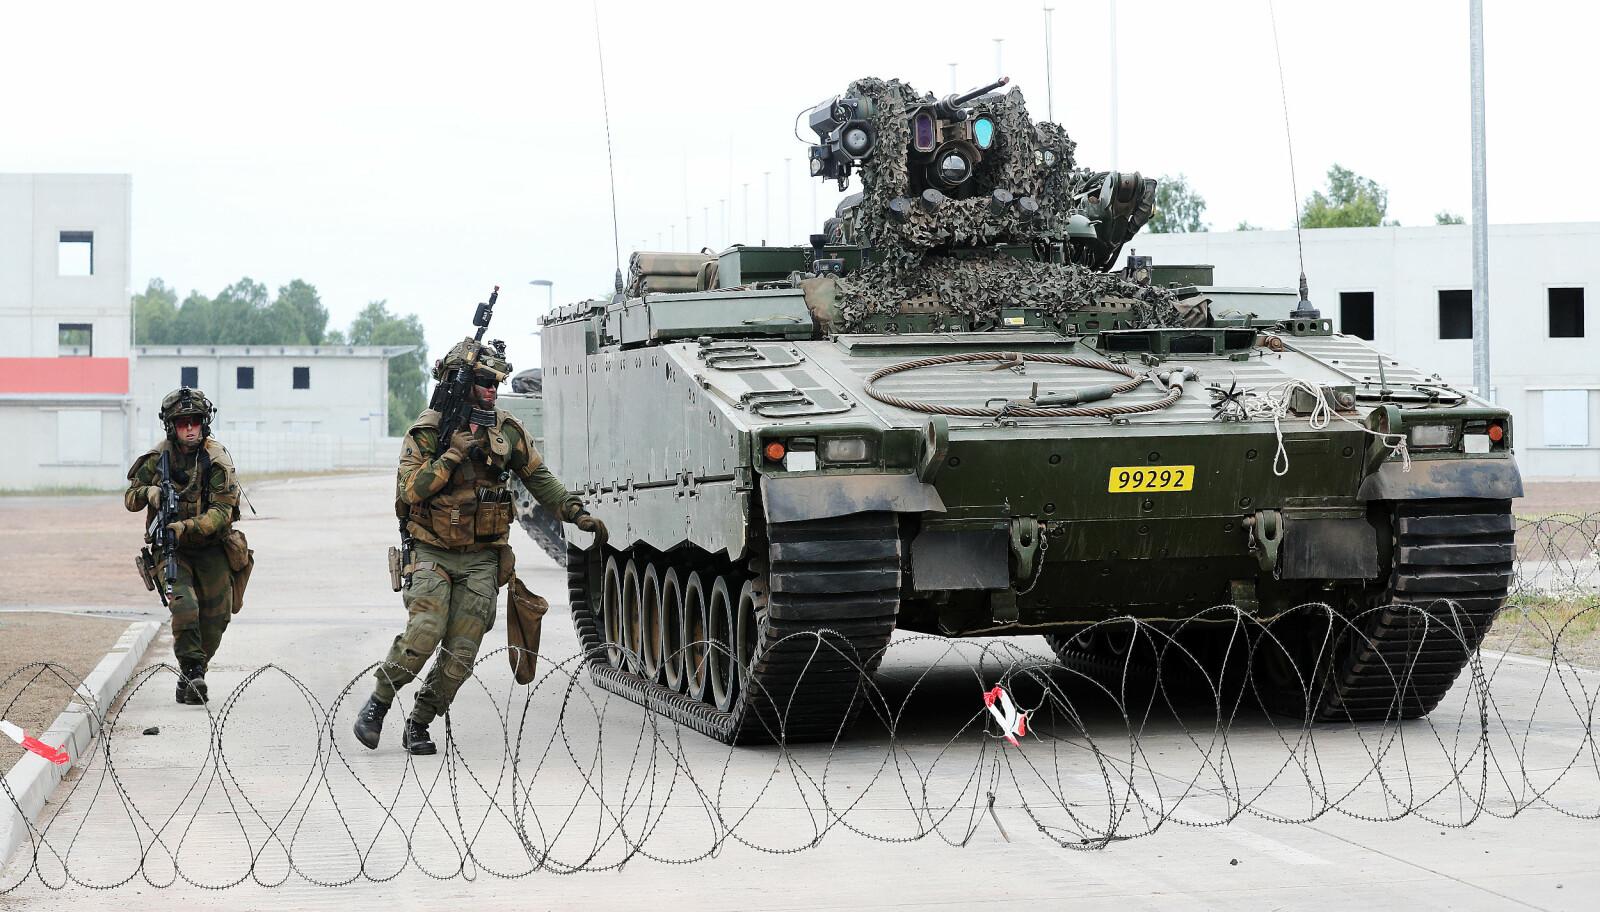 <b>ØVELSE:</b> Soldater fra Telemark bataljon foran en CV90 stingvogn under en øvelse i Altmark Training Area i Tyskland